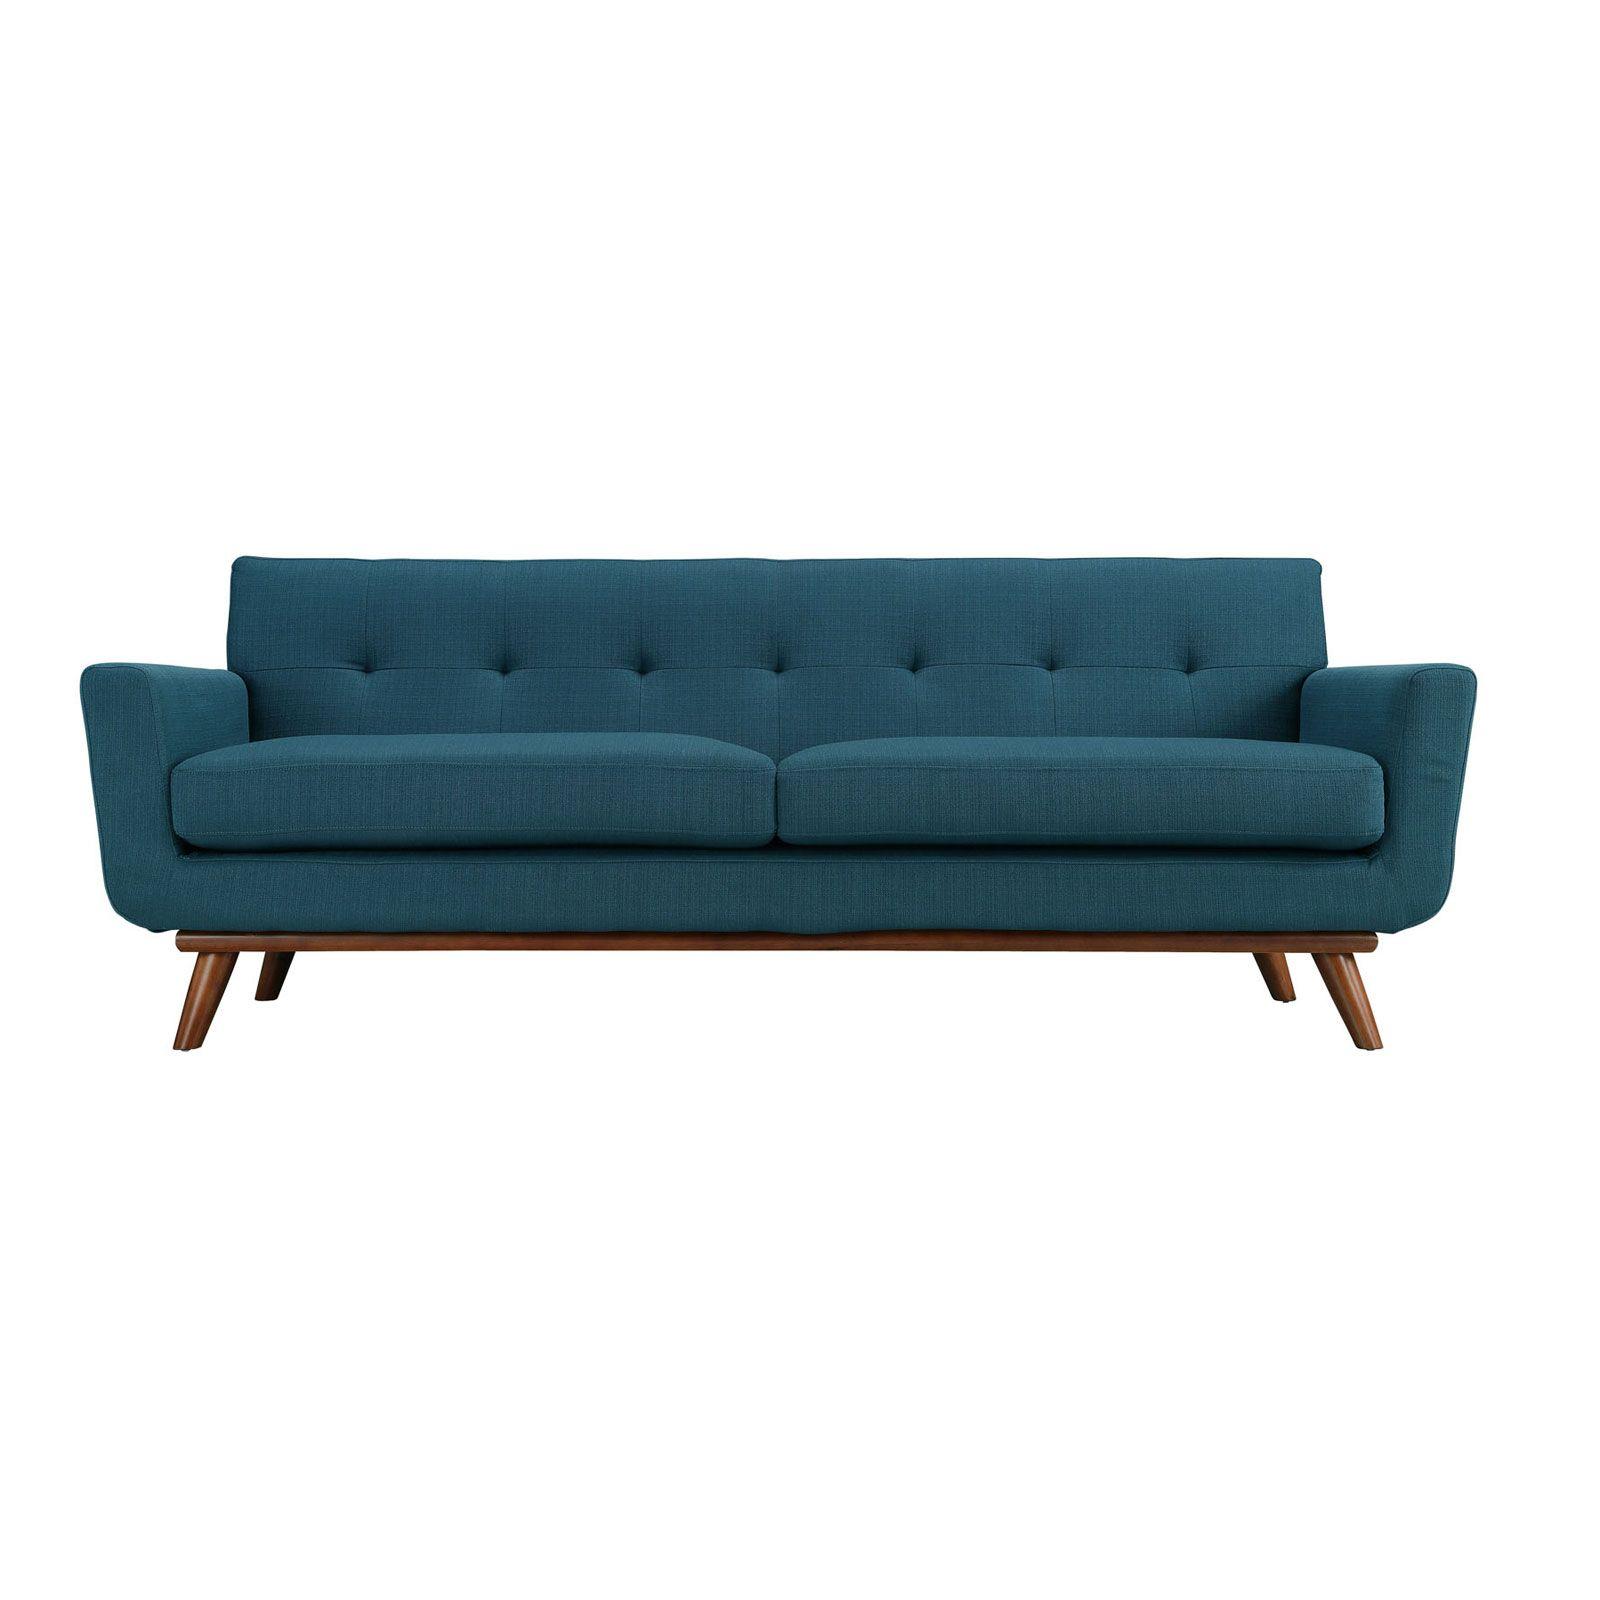 Spiers Sofa in Teal | dotandbo.com